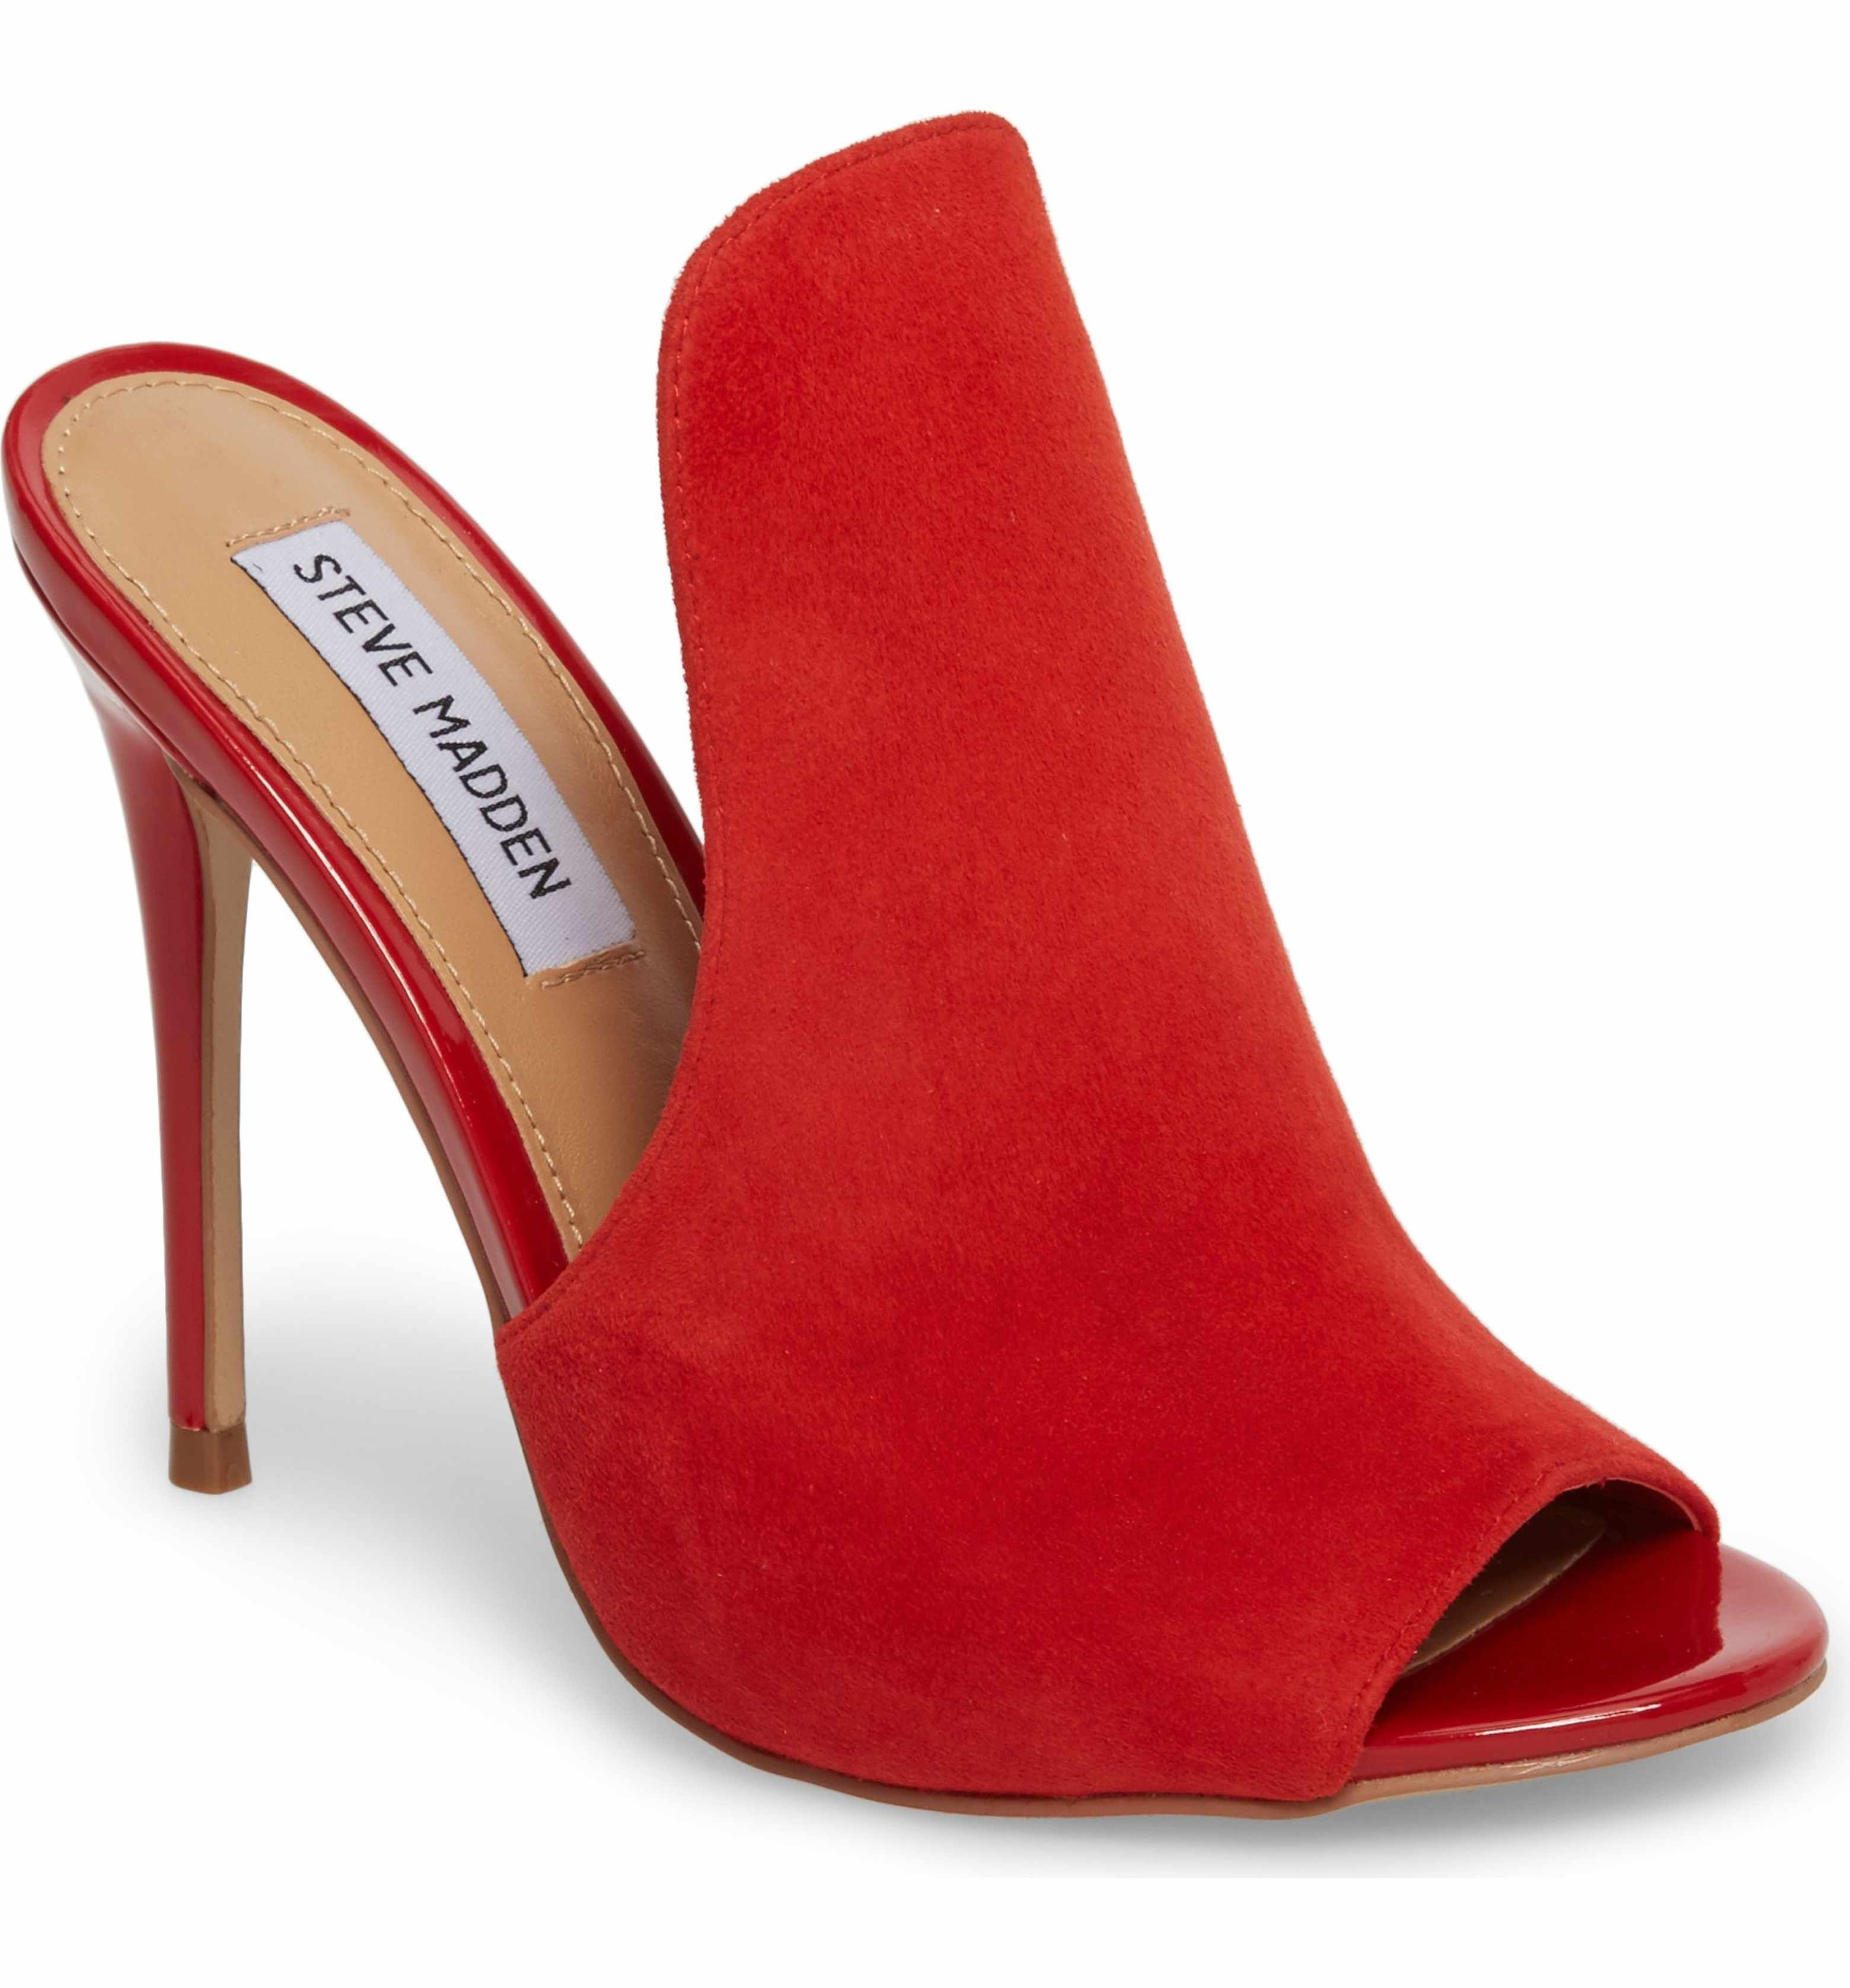 e1033c9003d8 Main Image - Steve Madden Sinful Sandal (Women) Mules Shoes